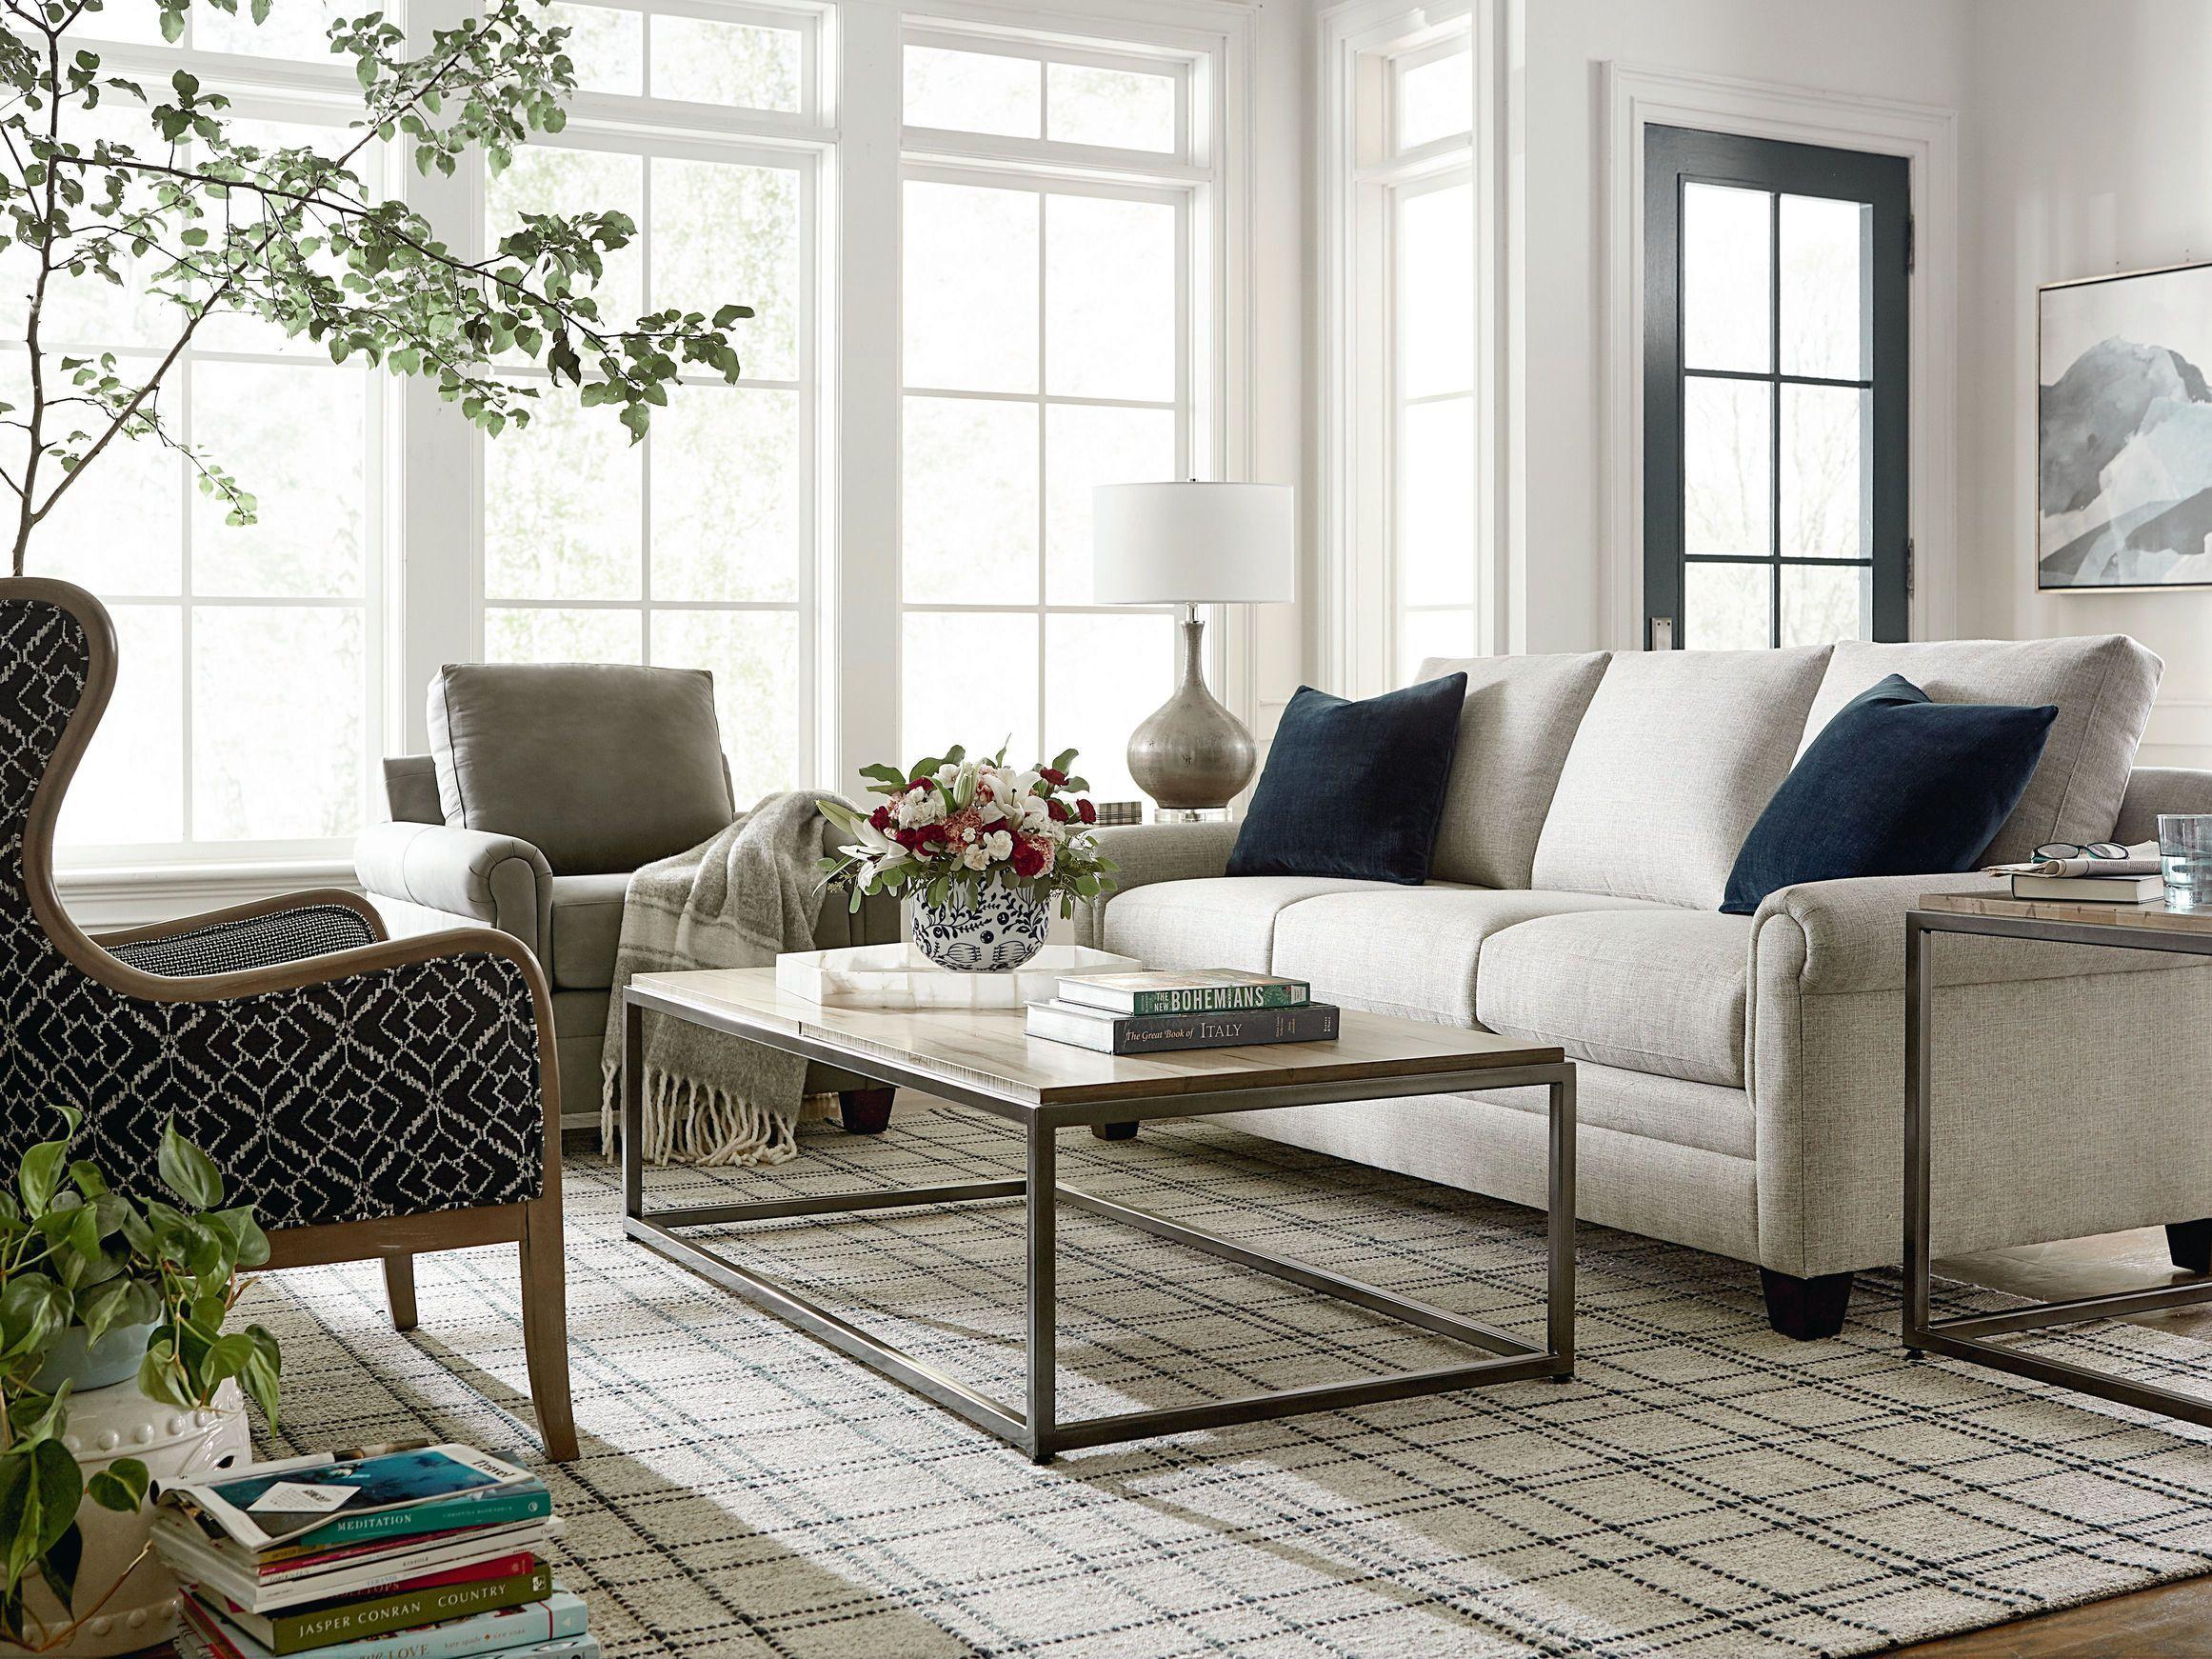 Carolina Panel Arm Sofa Bassett Furniture Furniture Custom Furniture Design your own living room furniture